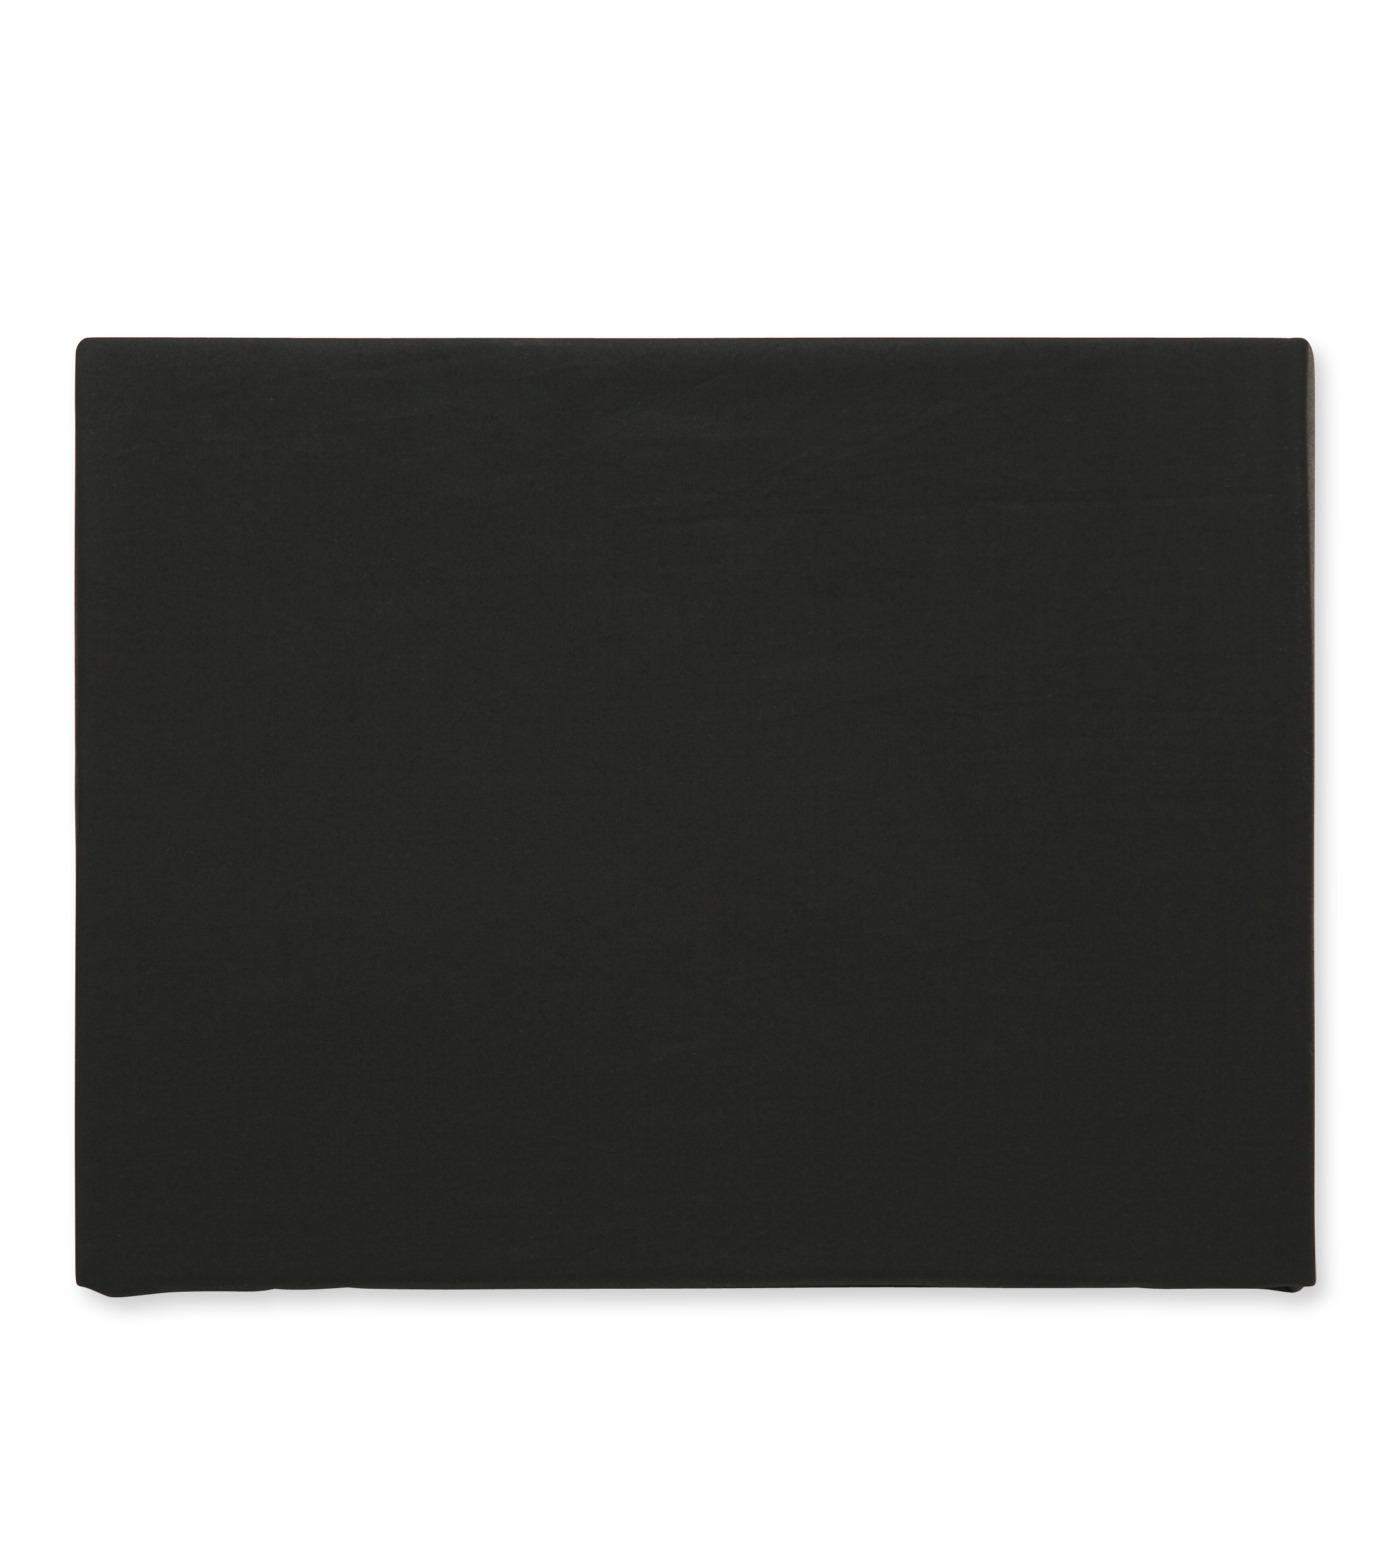 HEY YOU !(ヘイユウ)のBox sheet1/queen-BLACK(インテリア/interior)-box-sheet-Q-13 拡大詳細画像1